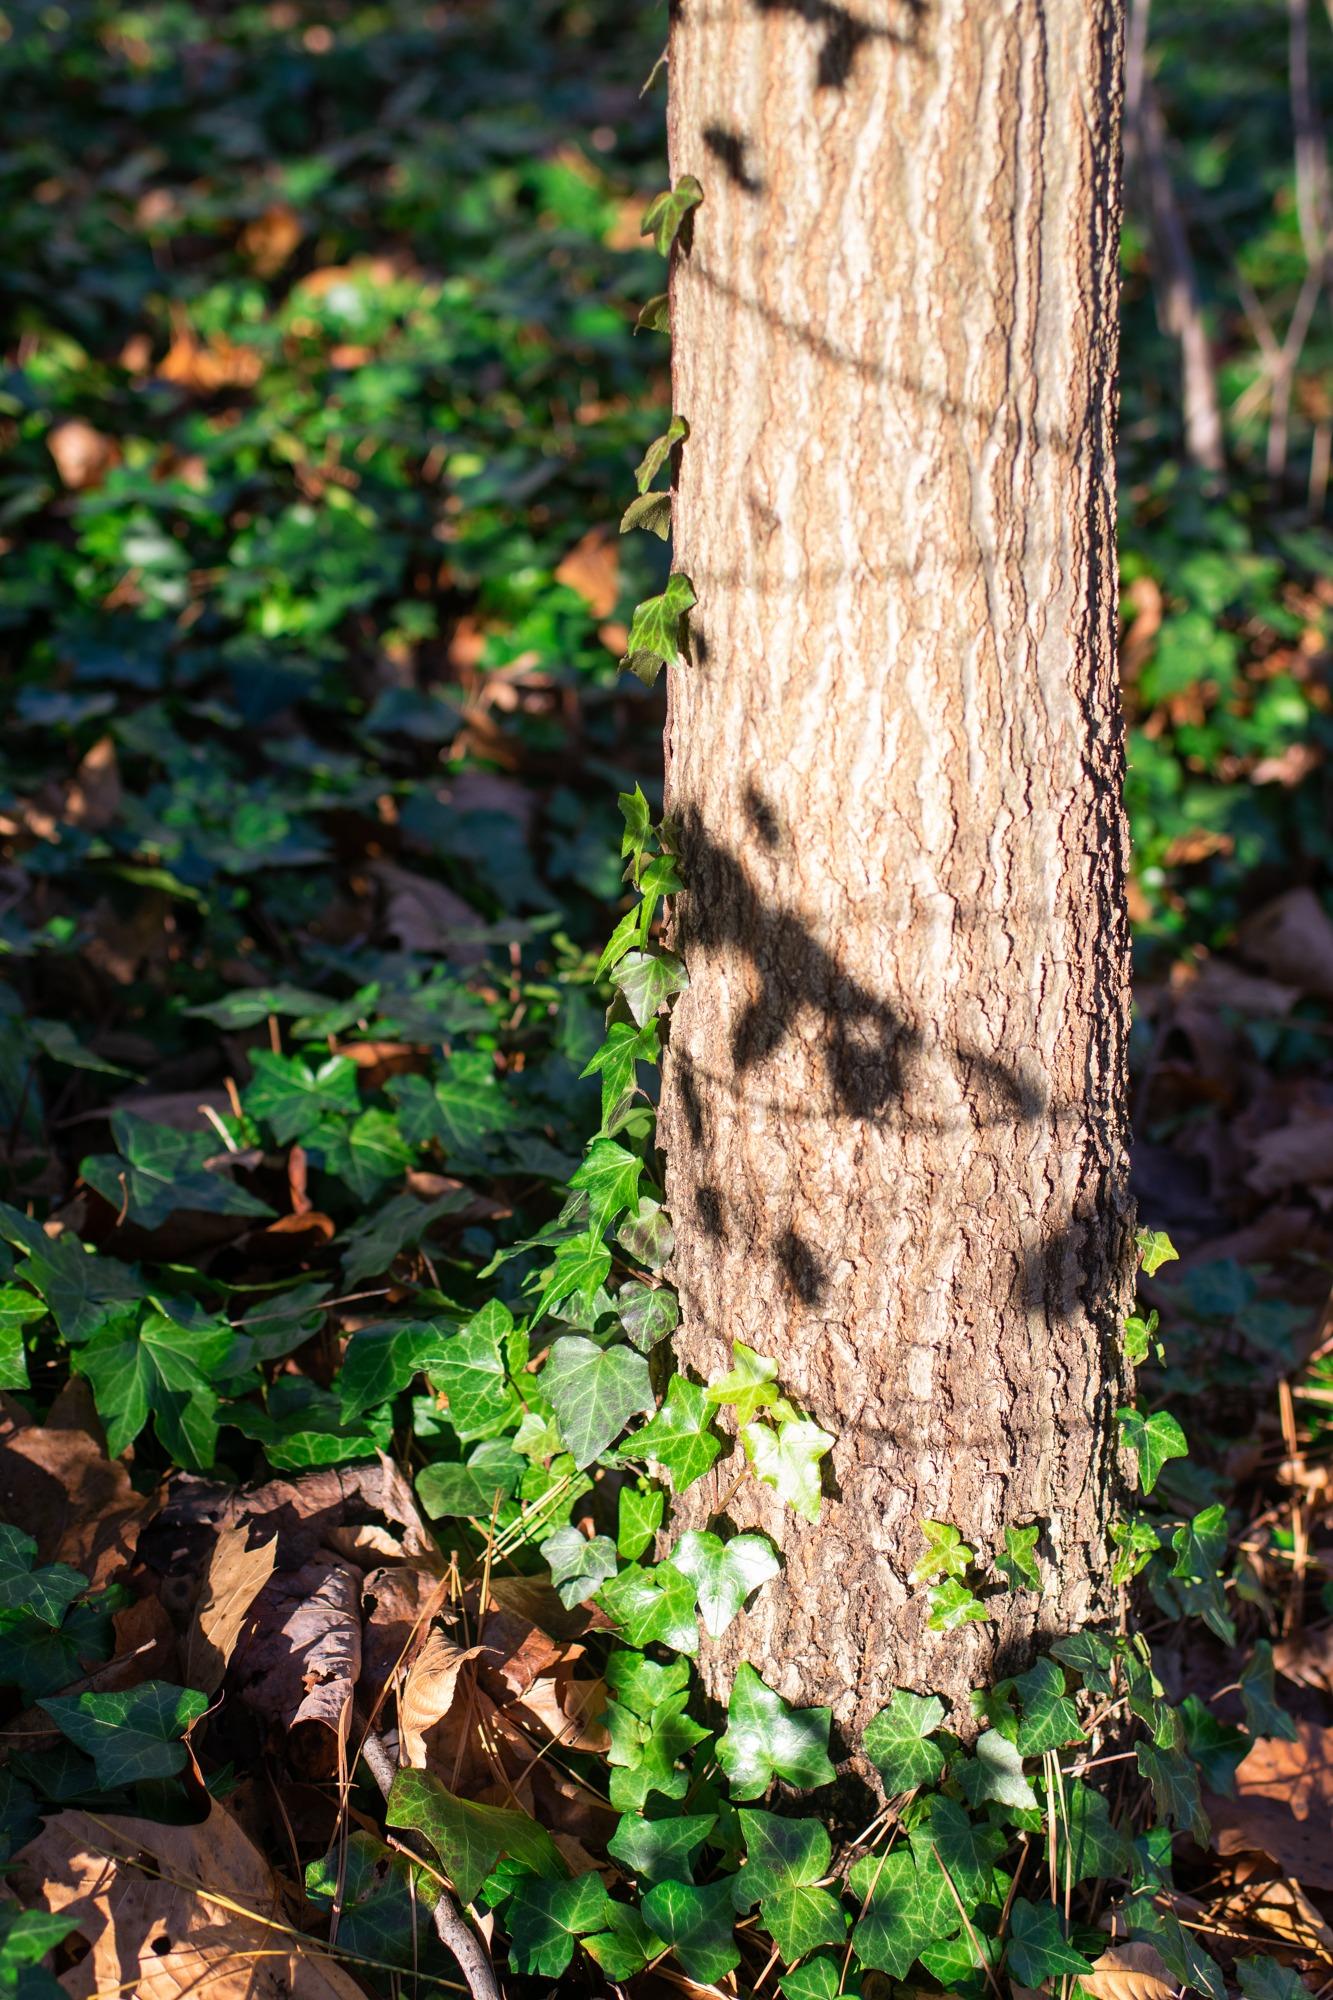 English ivy on tree trunk